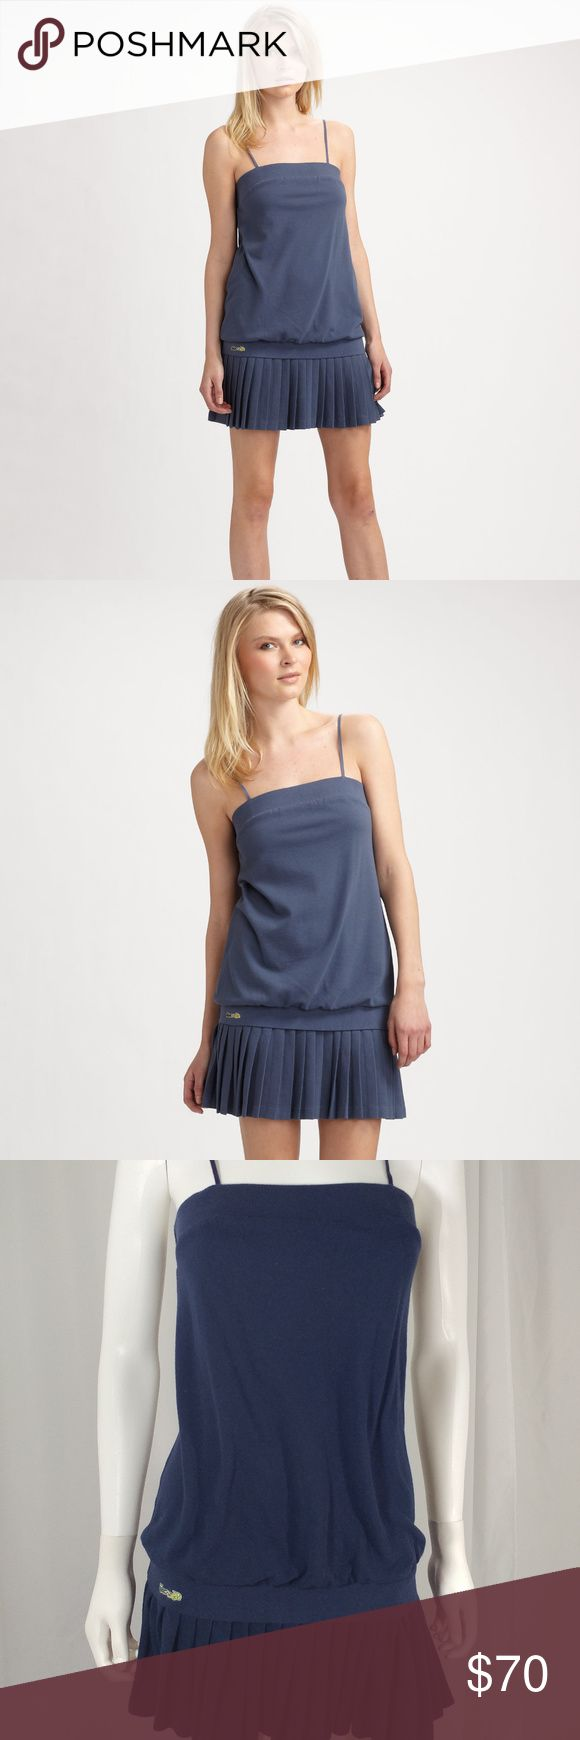 Lacoste + Malandrino Women Tornade Dress Lacoste + Malandrino Women Tornade Ruffle Tube Top Dress. Lacoste Dresses Mini